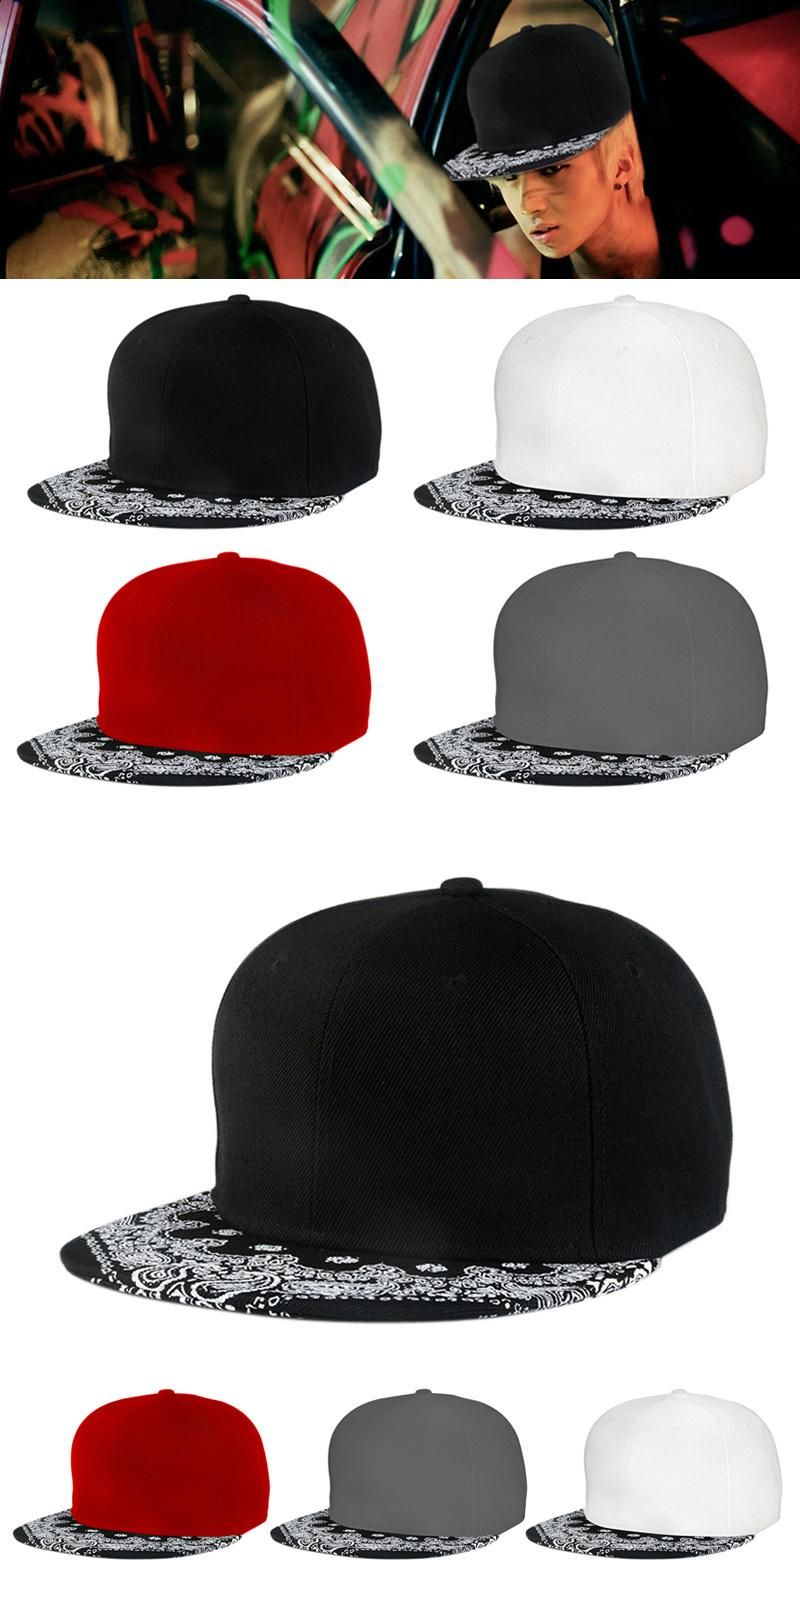 08aeee549 [Visit to Buy] Hot New Paisley Black Unisex Snapback Hats Men Women Hip-Hop  Dance Adjustable Bboy Baseball Cap gorras Cheap Z1 #Advertisement